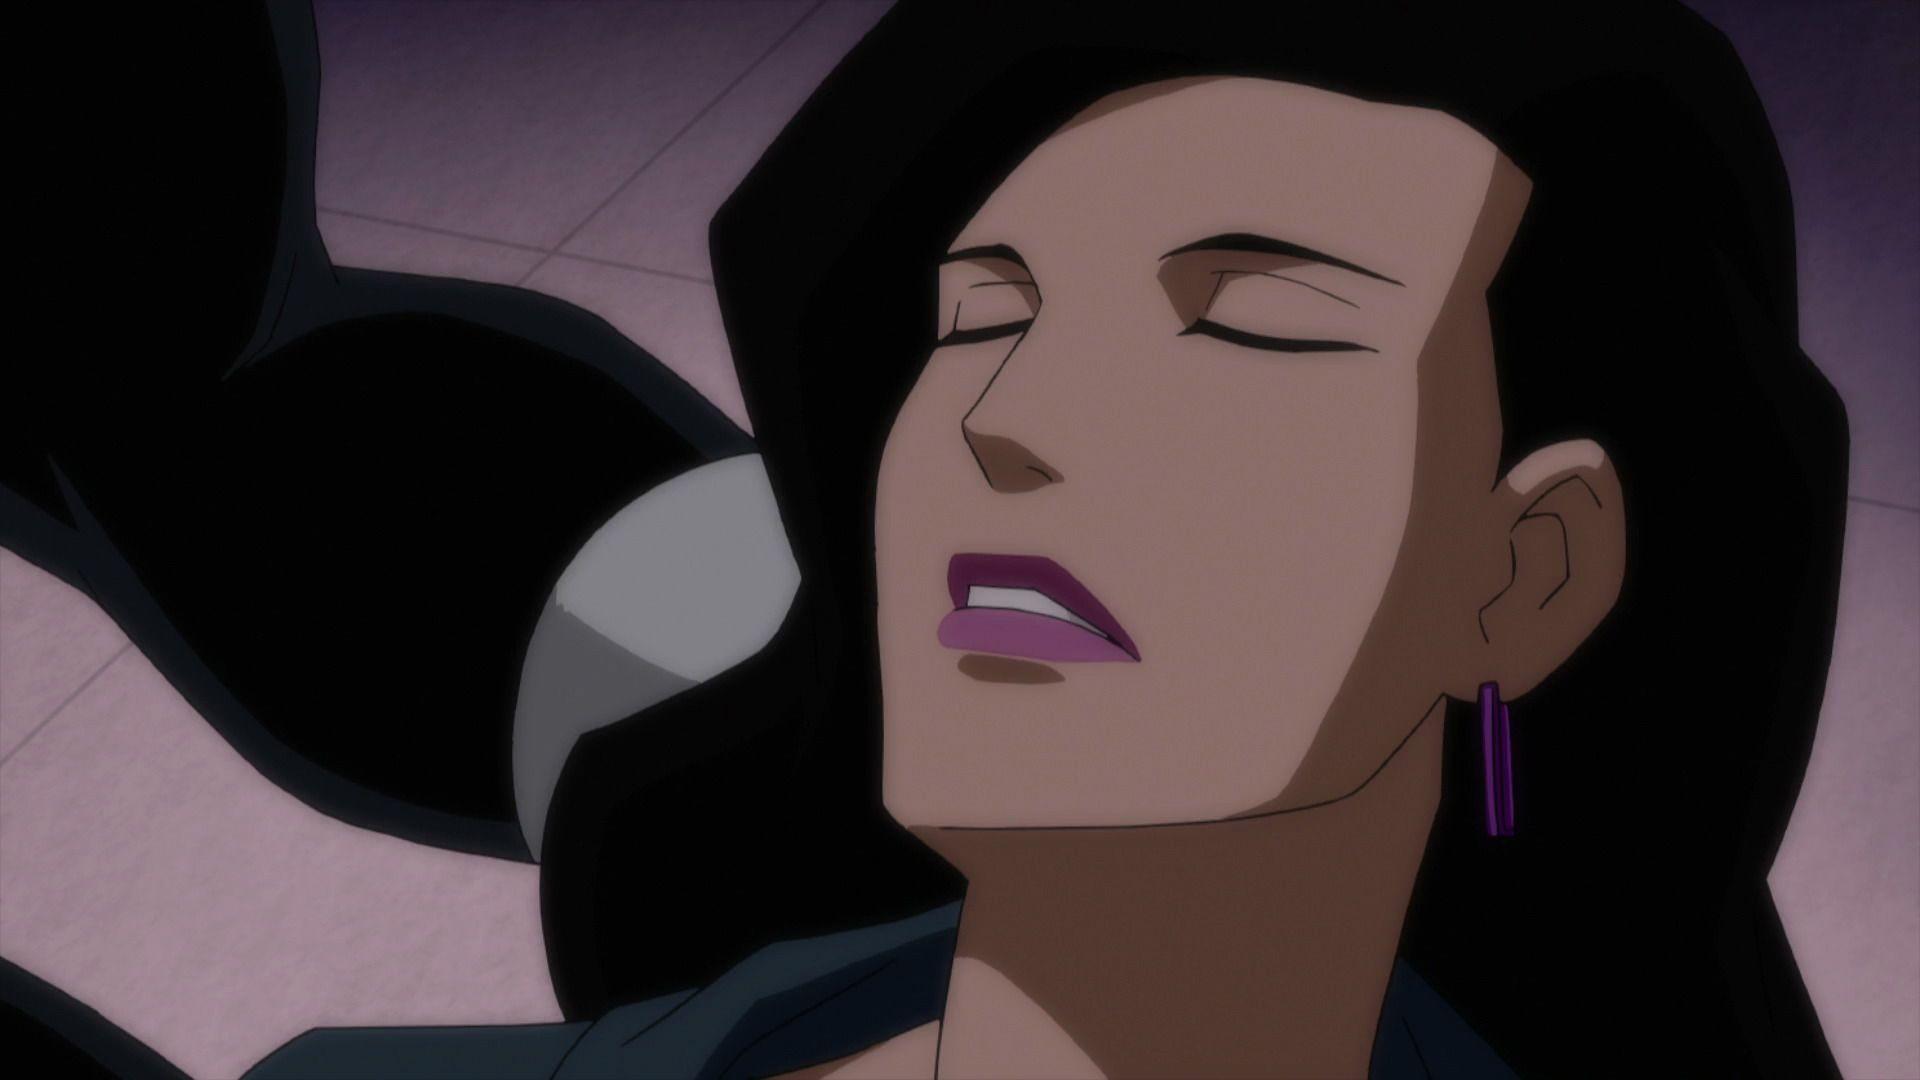 Justice League Doom Carol Ferris Justice League Doom Justice League Carole